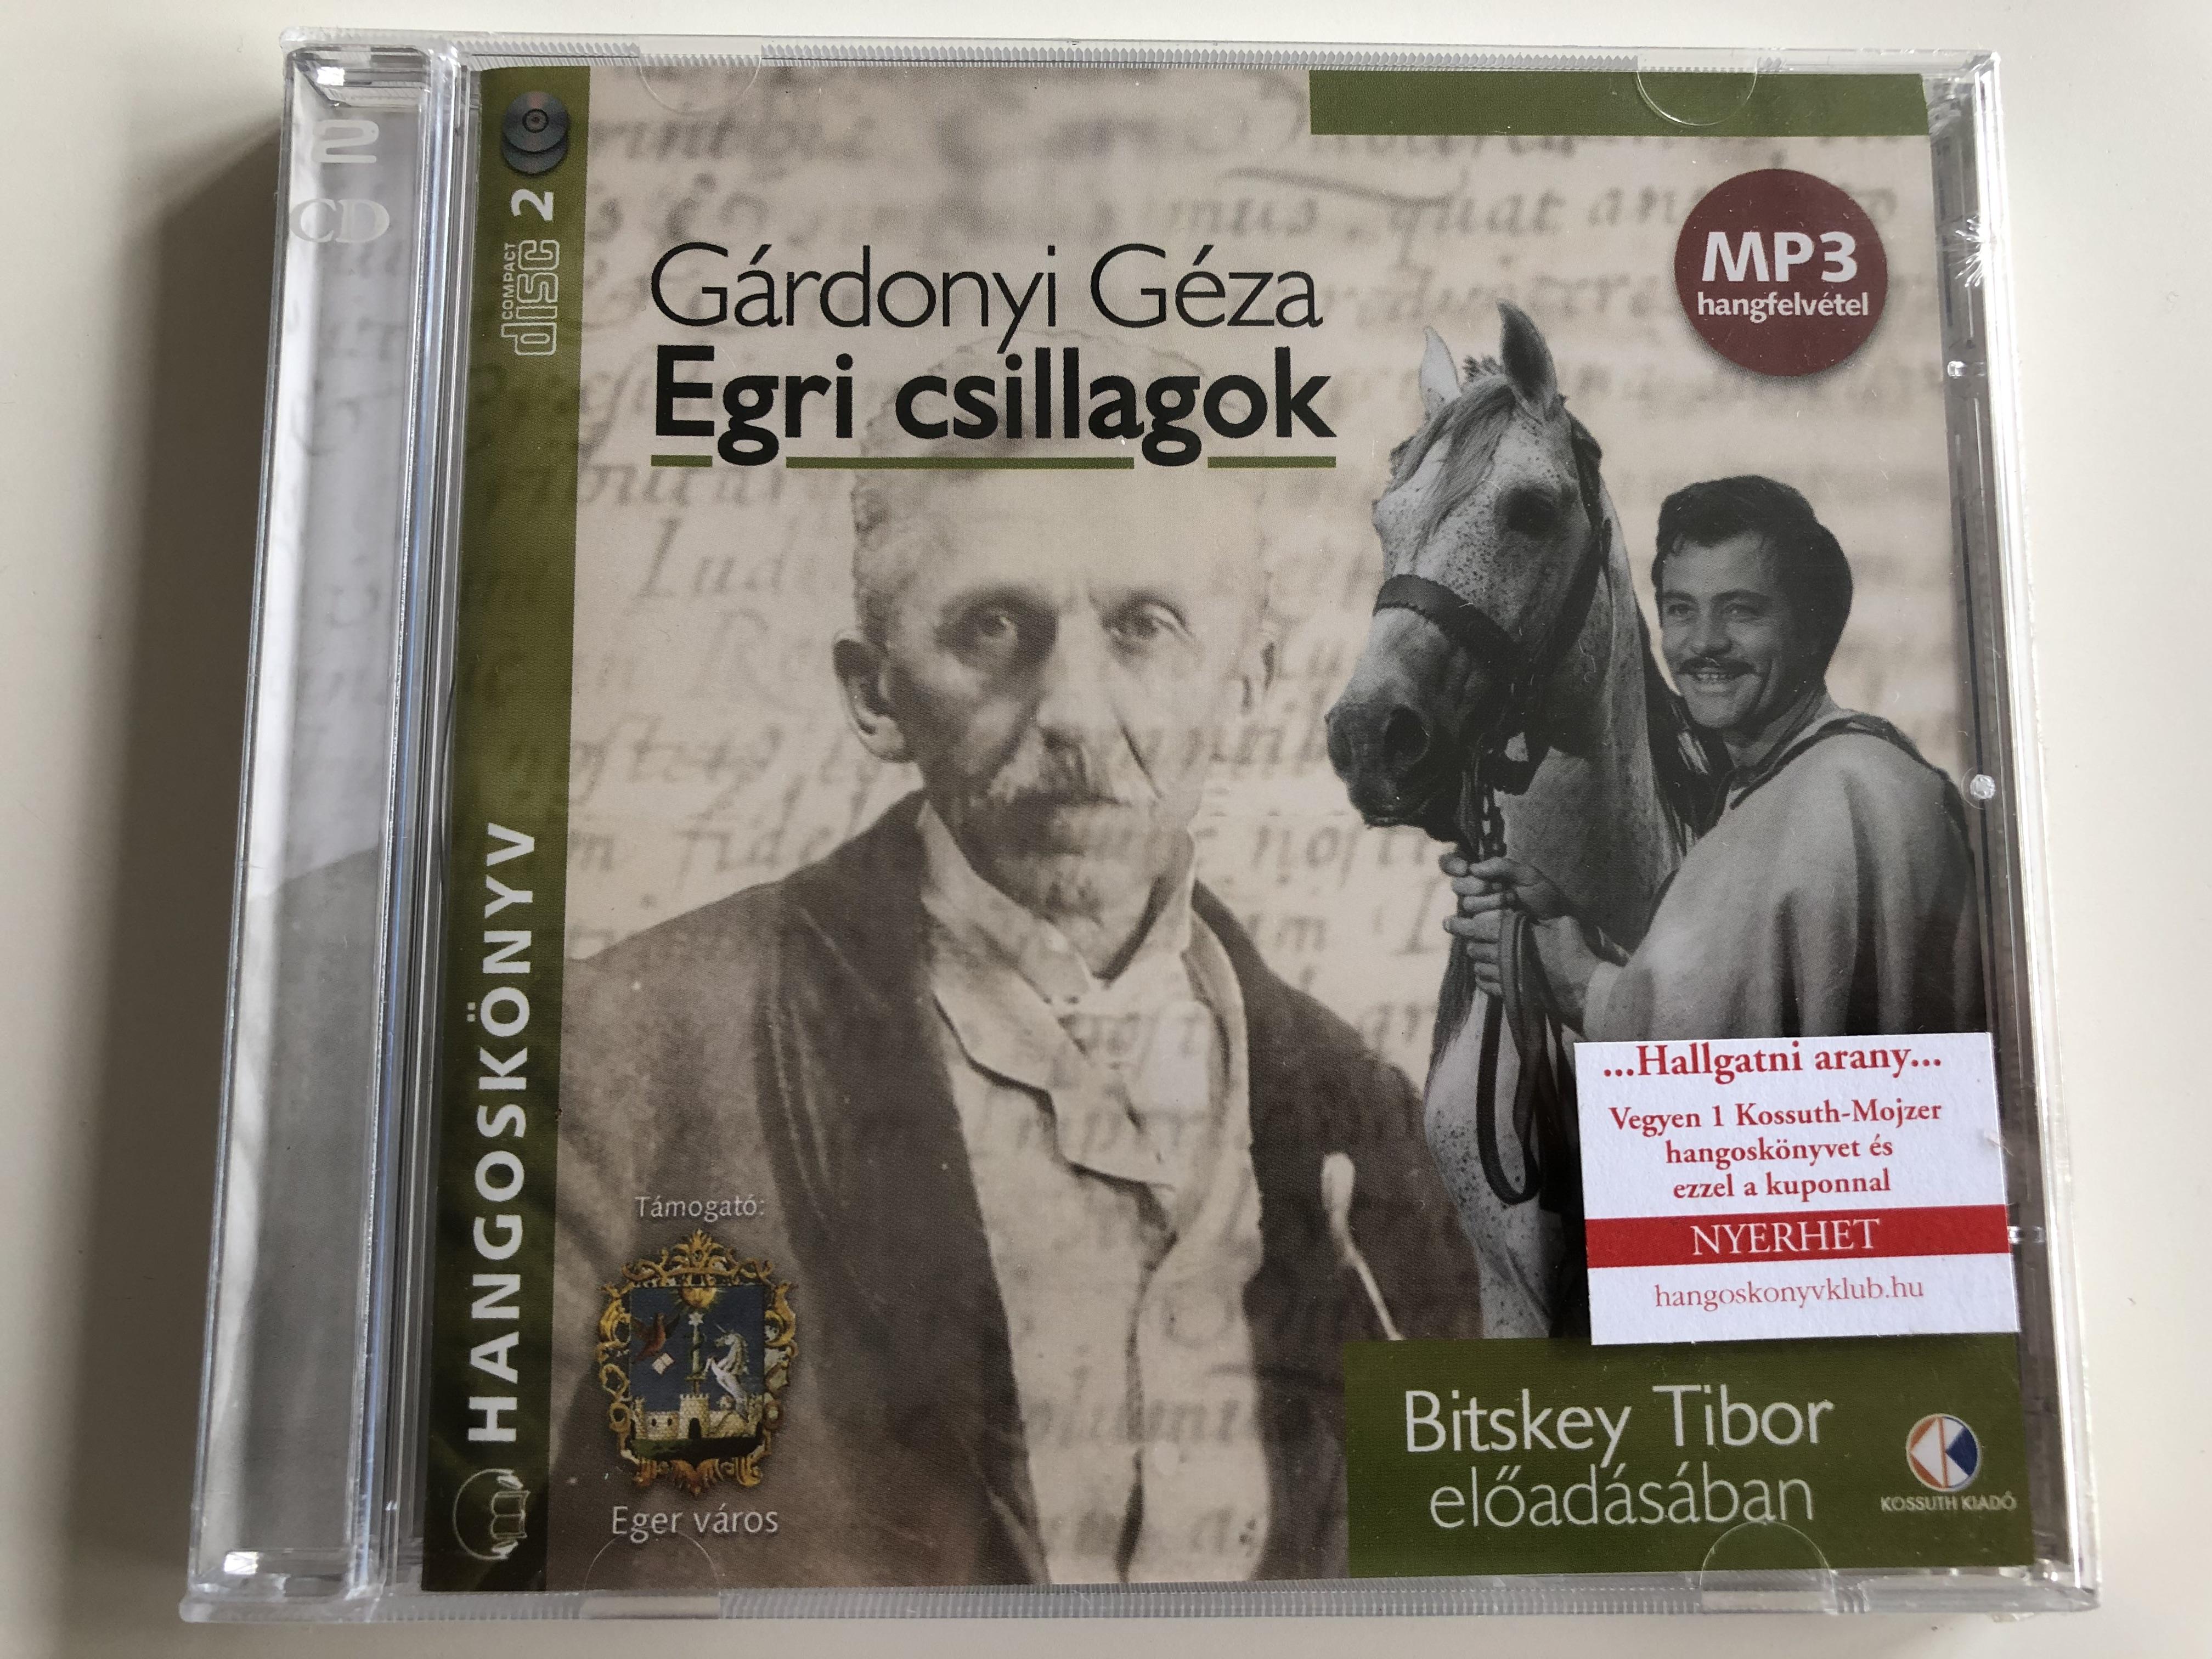 g-rdonyi-g-za-egri-csillagok-hangosk-nyv-2-mp3-cd-read-by-bitskey-tibor-el-ad-s-ban-famous-hungarian-novel-audiobook-mp3-cd-2005-kossuth-kiad-1-.jpg